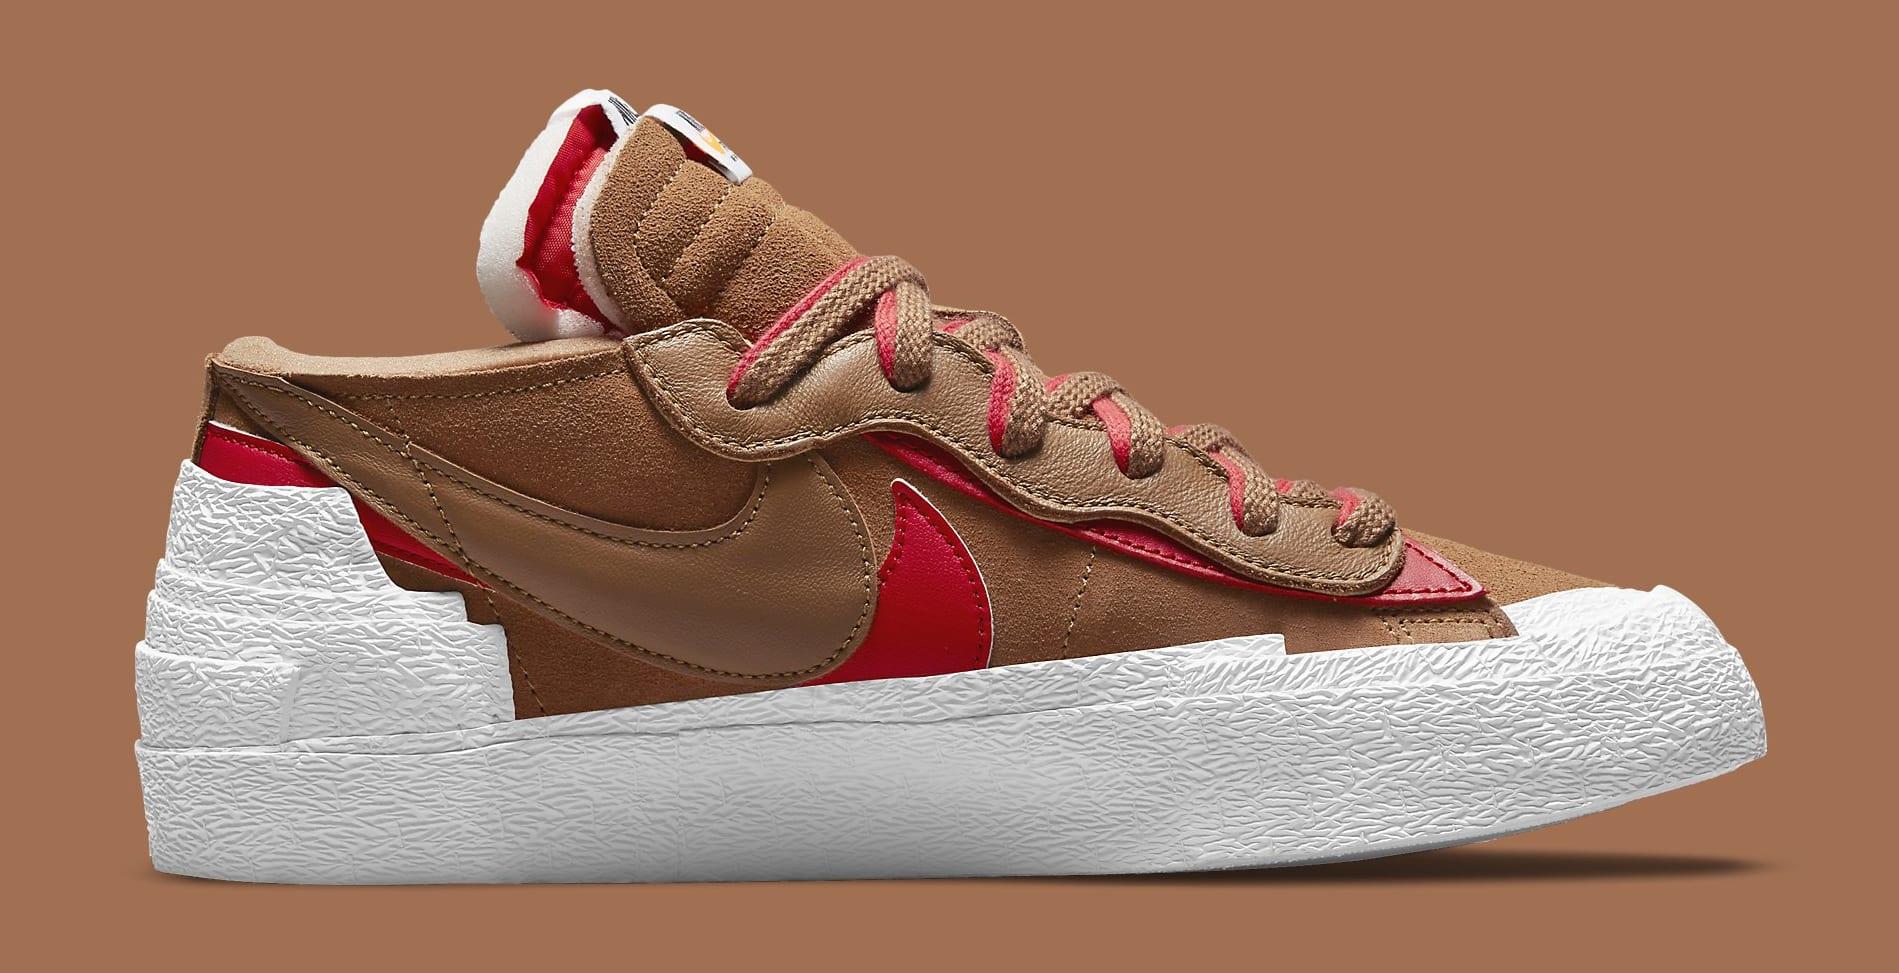 Sacai x Nike Blazer Low 'British Tan' DD1877-200 Medial